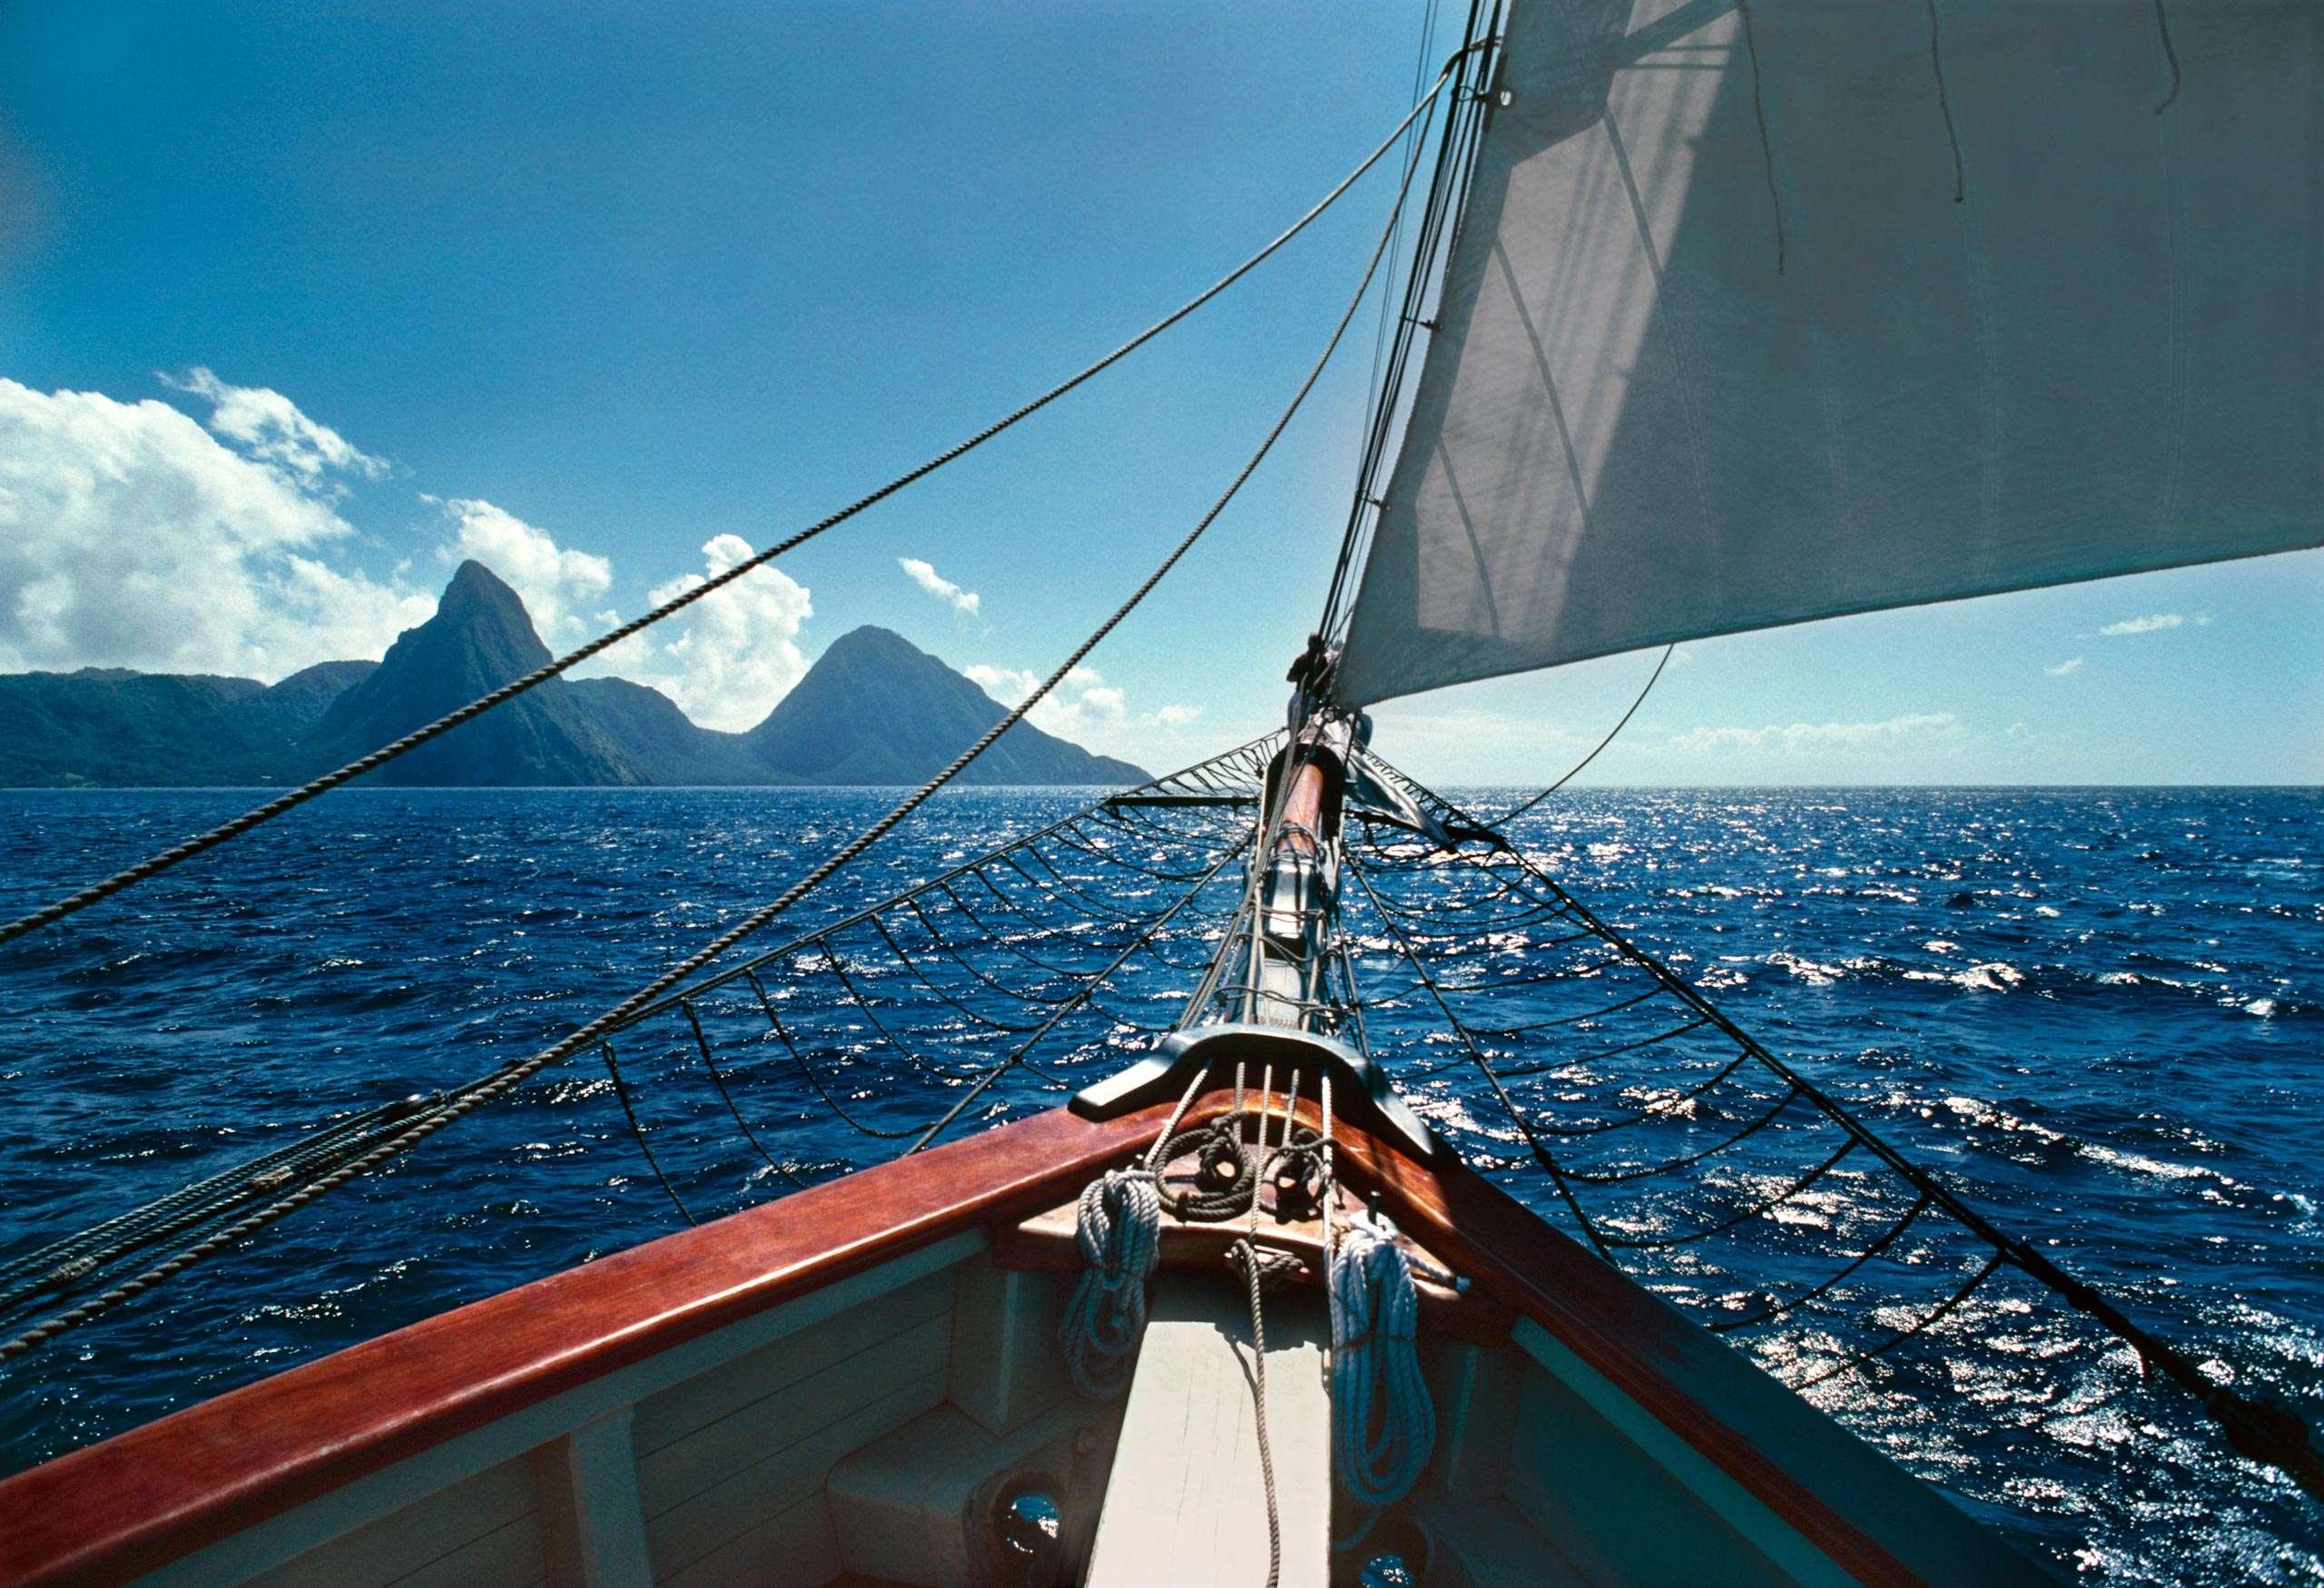 PORTFOLIO - Sailing - Windjammers #22   PCG084